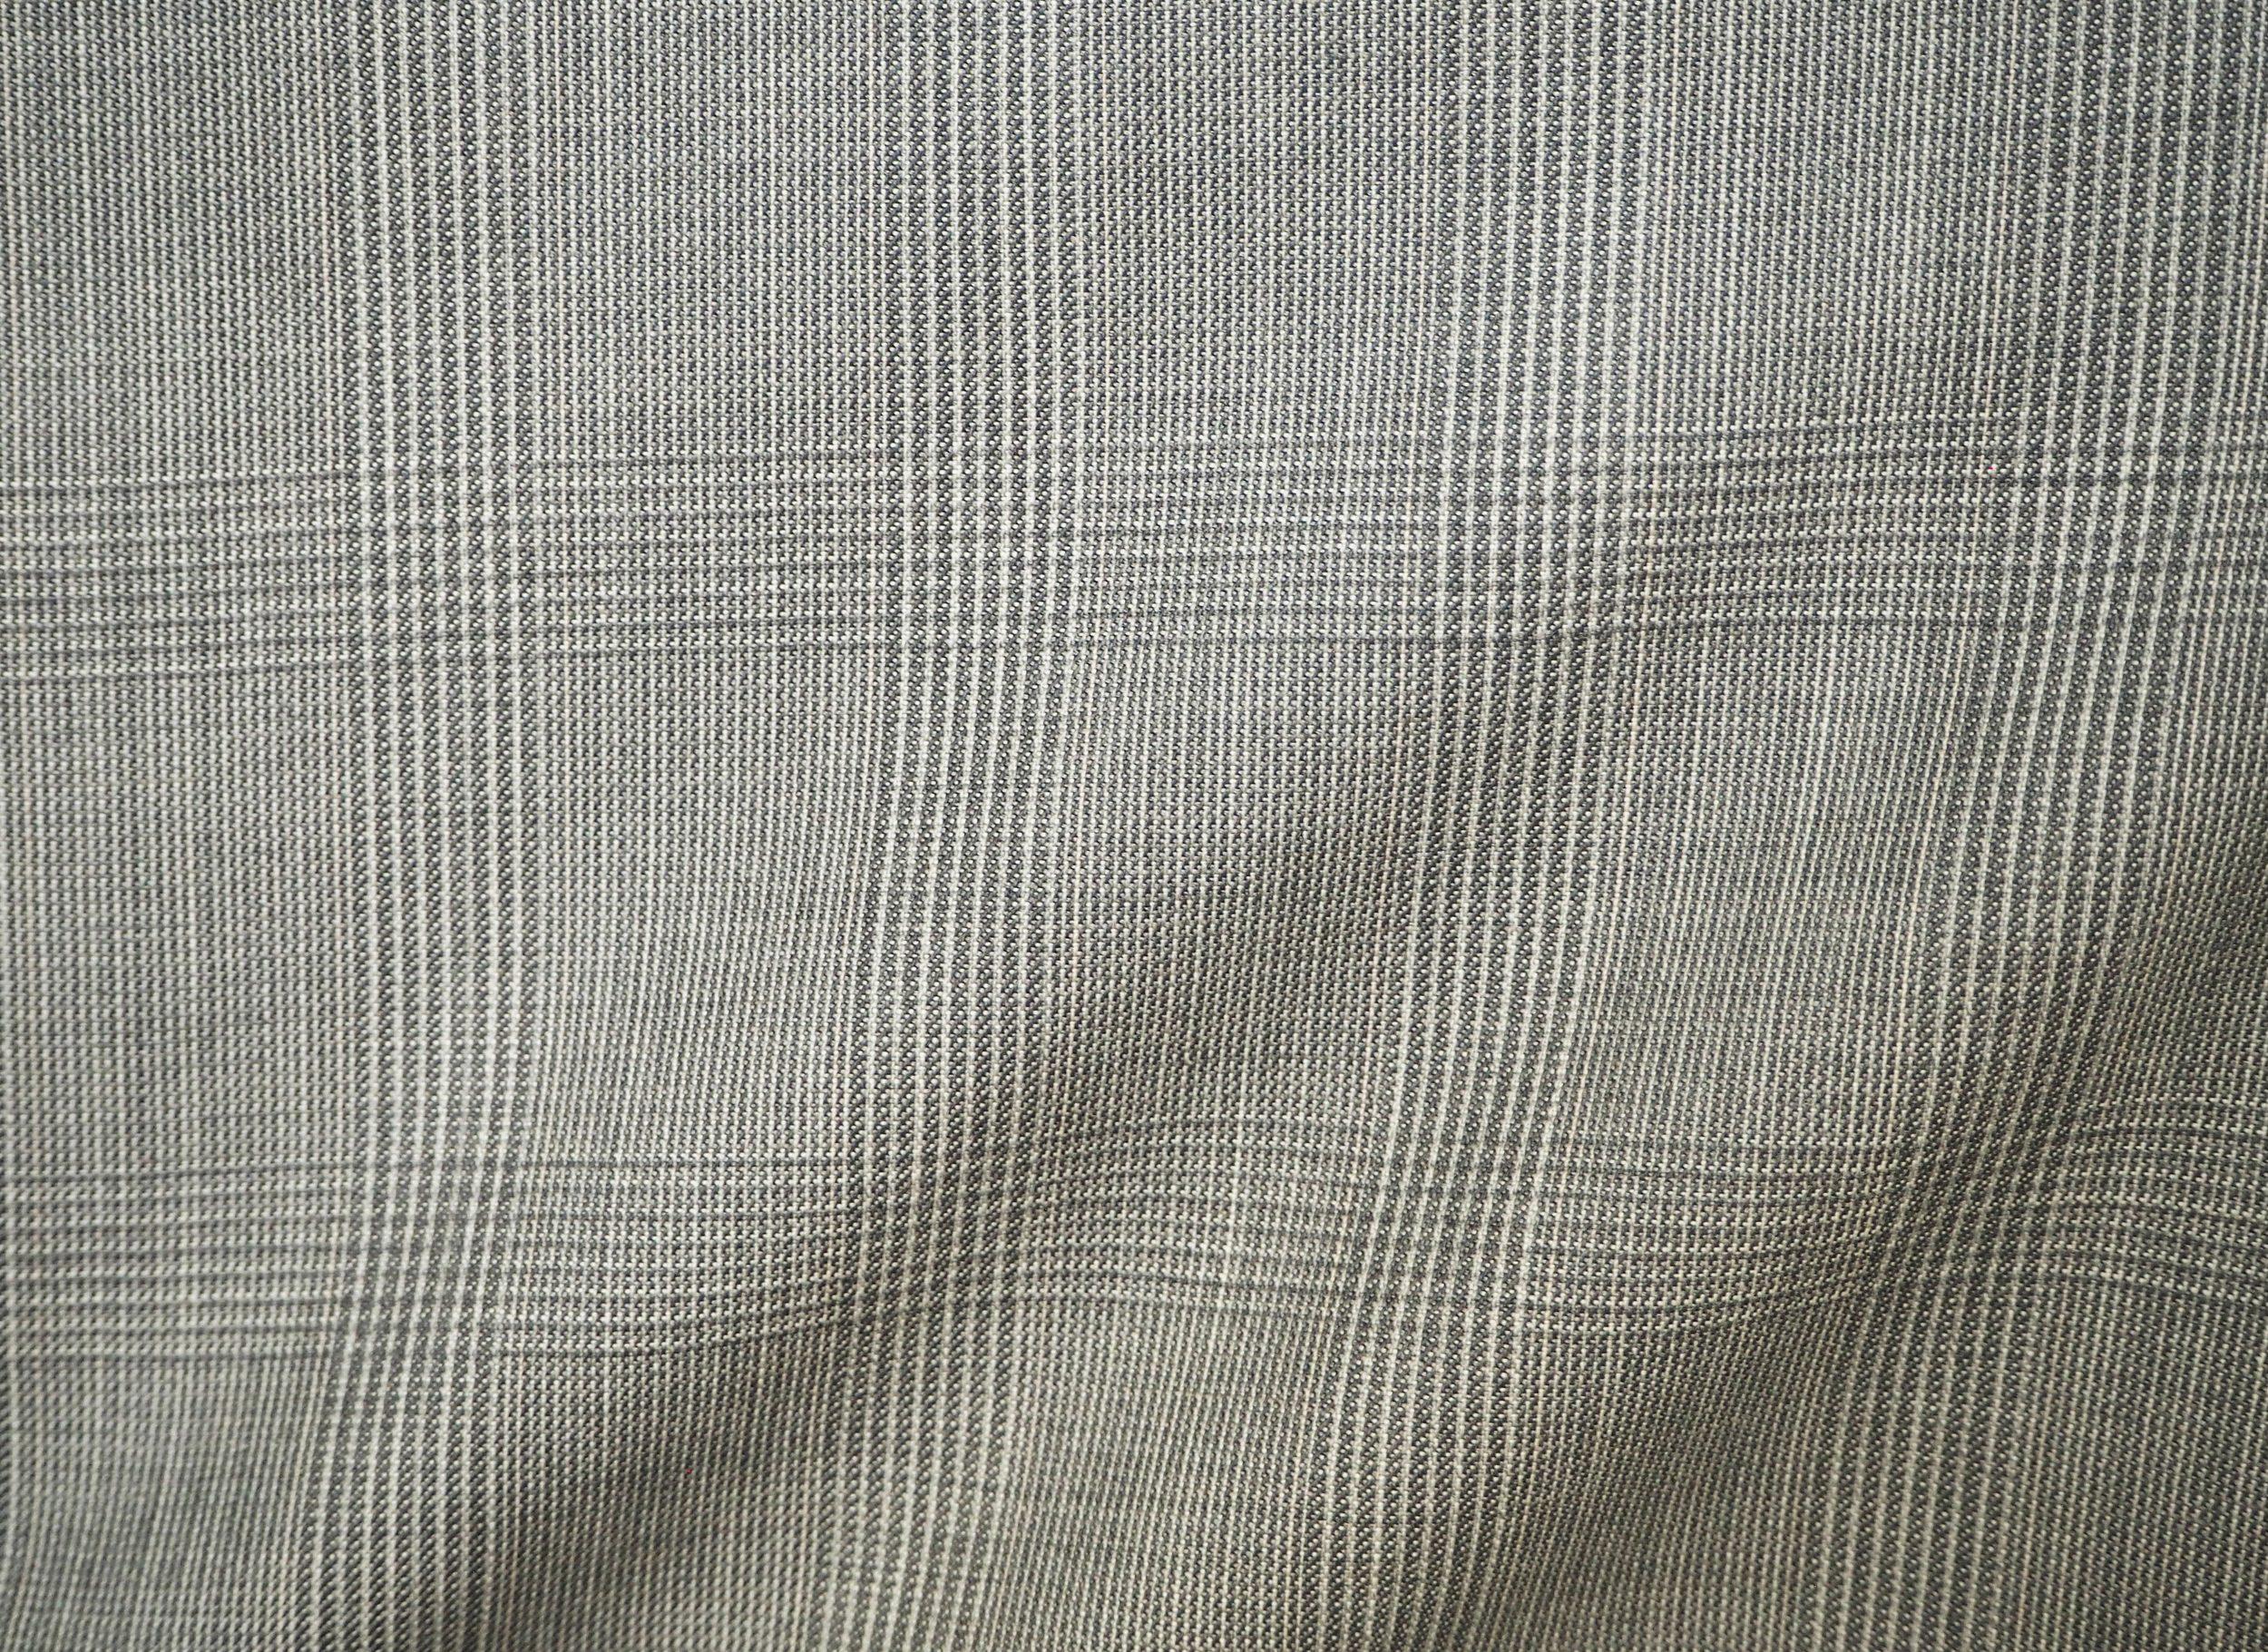 Stof---mønstret-lys-grå.jpg